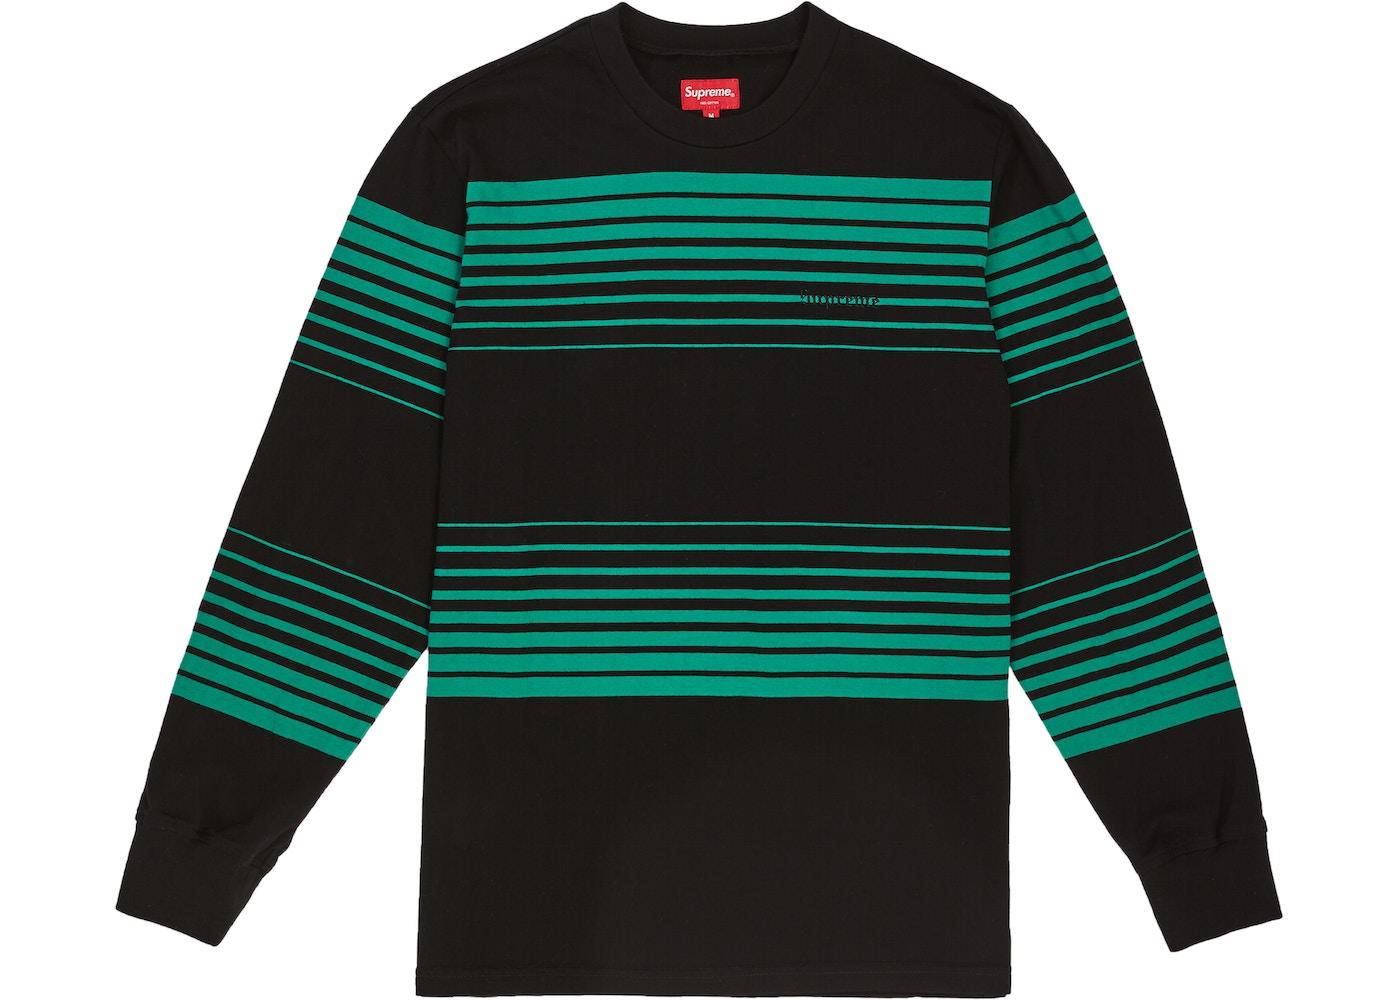 e562e3ff843c Buy   Sell Streetwear - Supreme